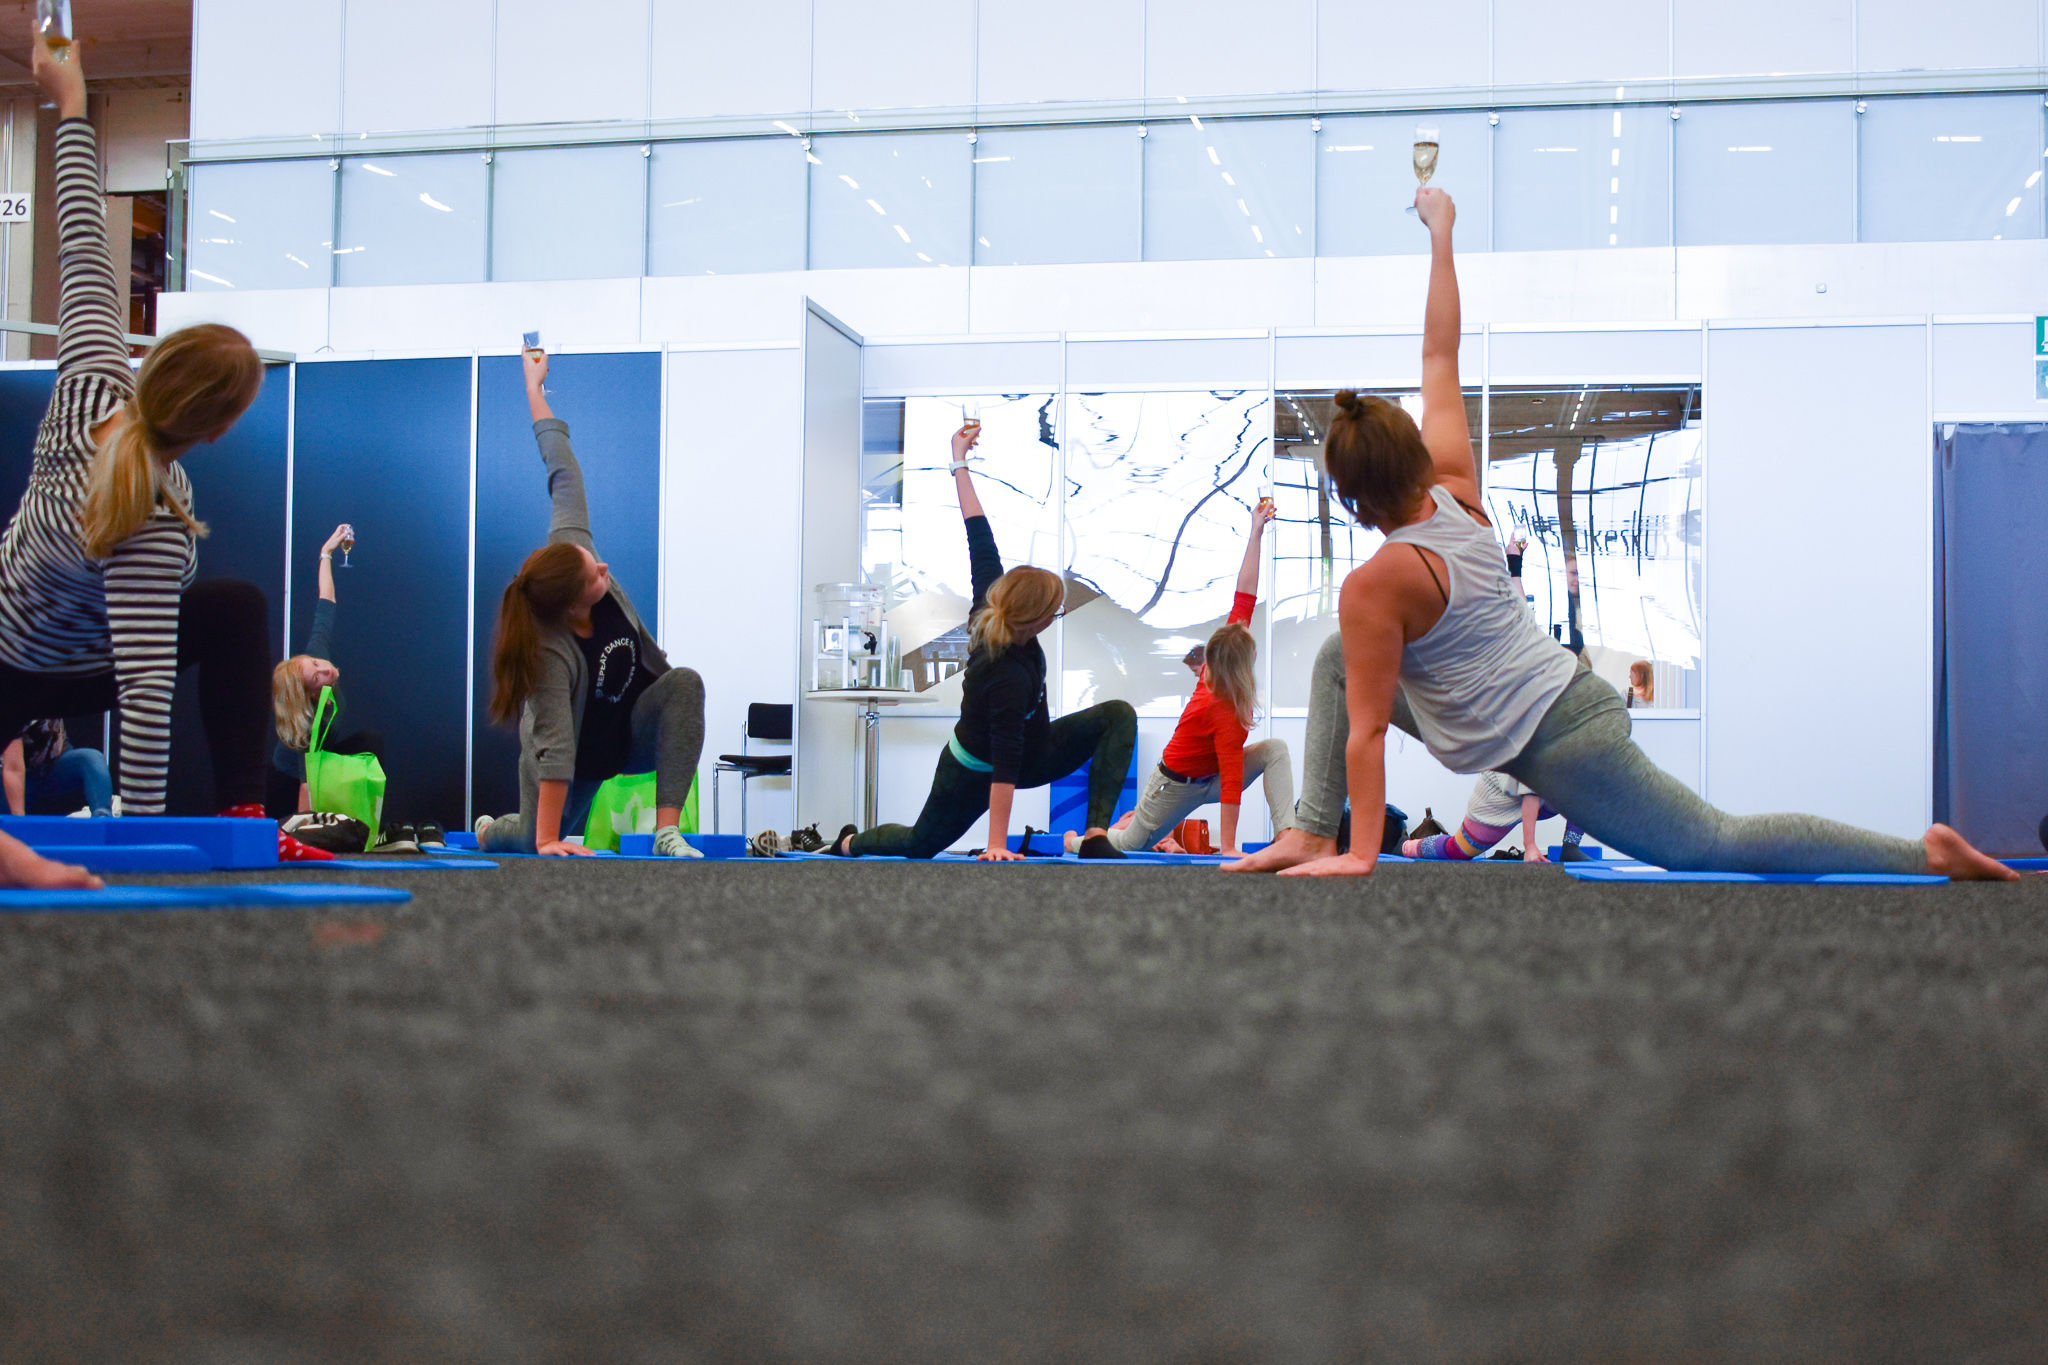 Yoga-Nordic-iloveme-messut-2018